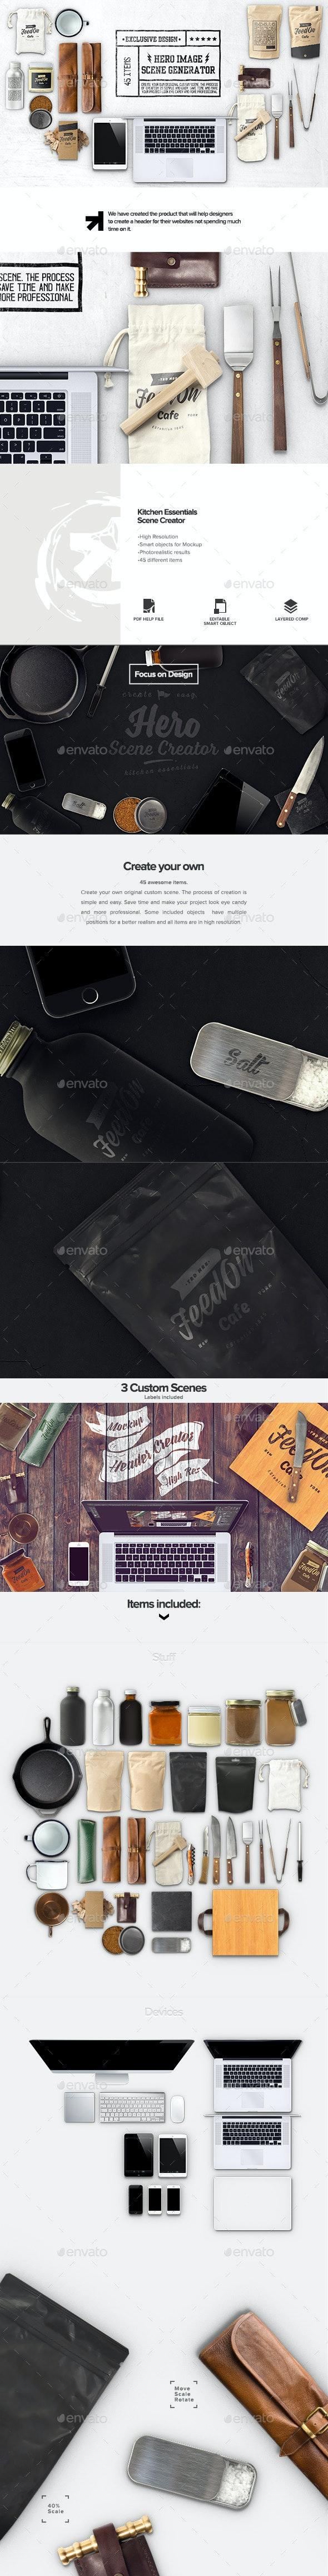 Hero Kitchen Essentials Mockup Creator - Hero Images Graphics